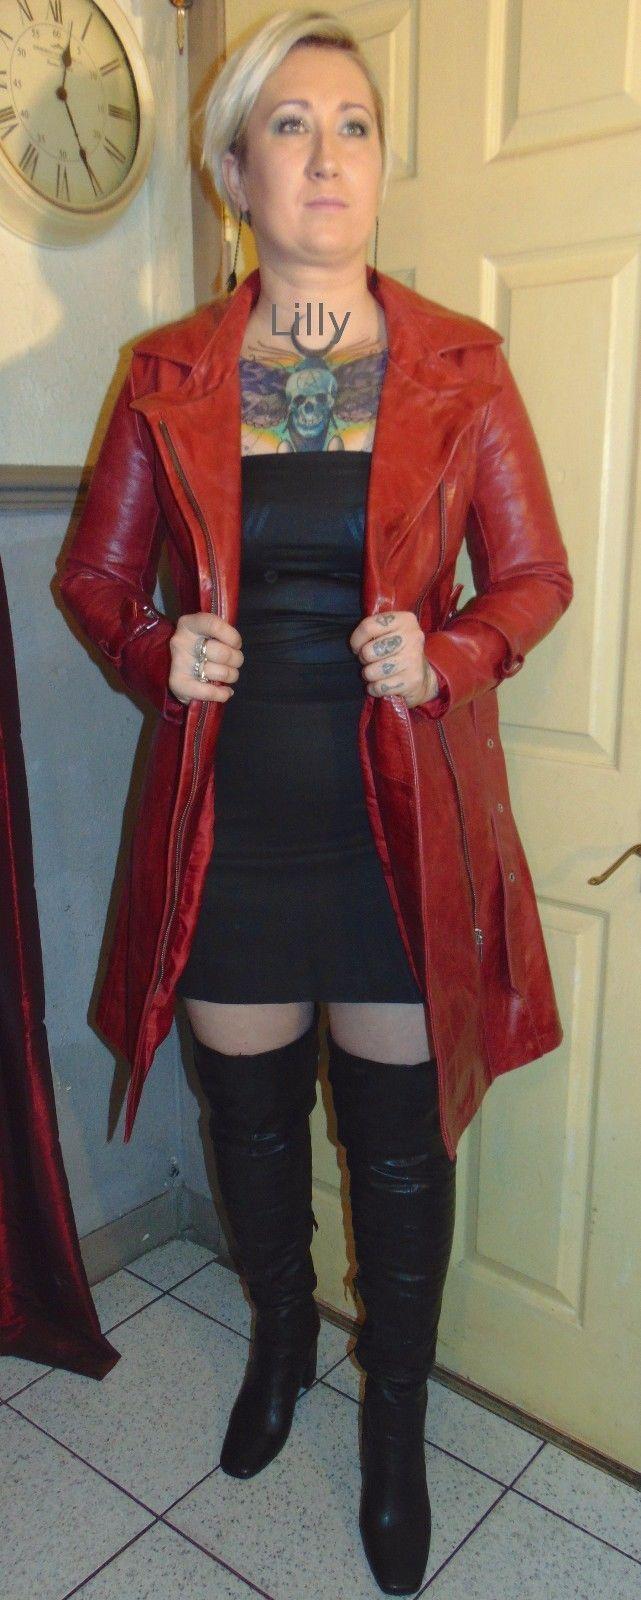 http://www.ebay.co.uk/itm/Ladies-Long-Zip-Red-Leather-Cuir-Cuero-Pelle-Coat-Size-8-UK-6-USA-34-EUR/122771645169?hash=item1c95c2a2f1:g:w34AAOSw1QpZ710B